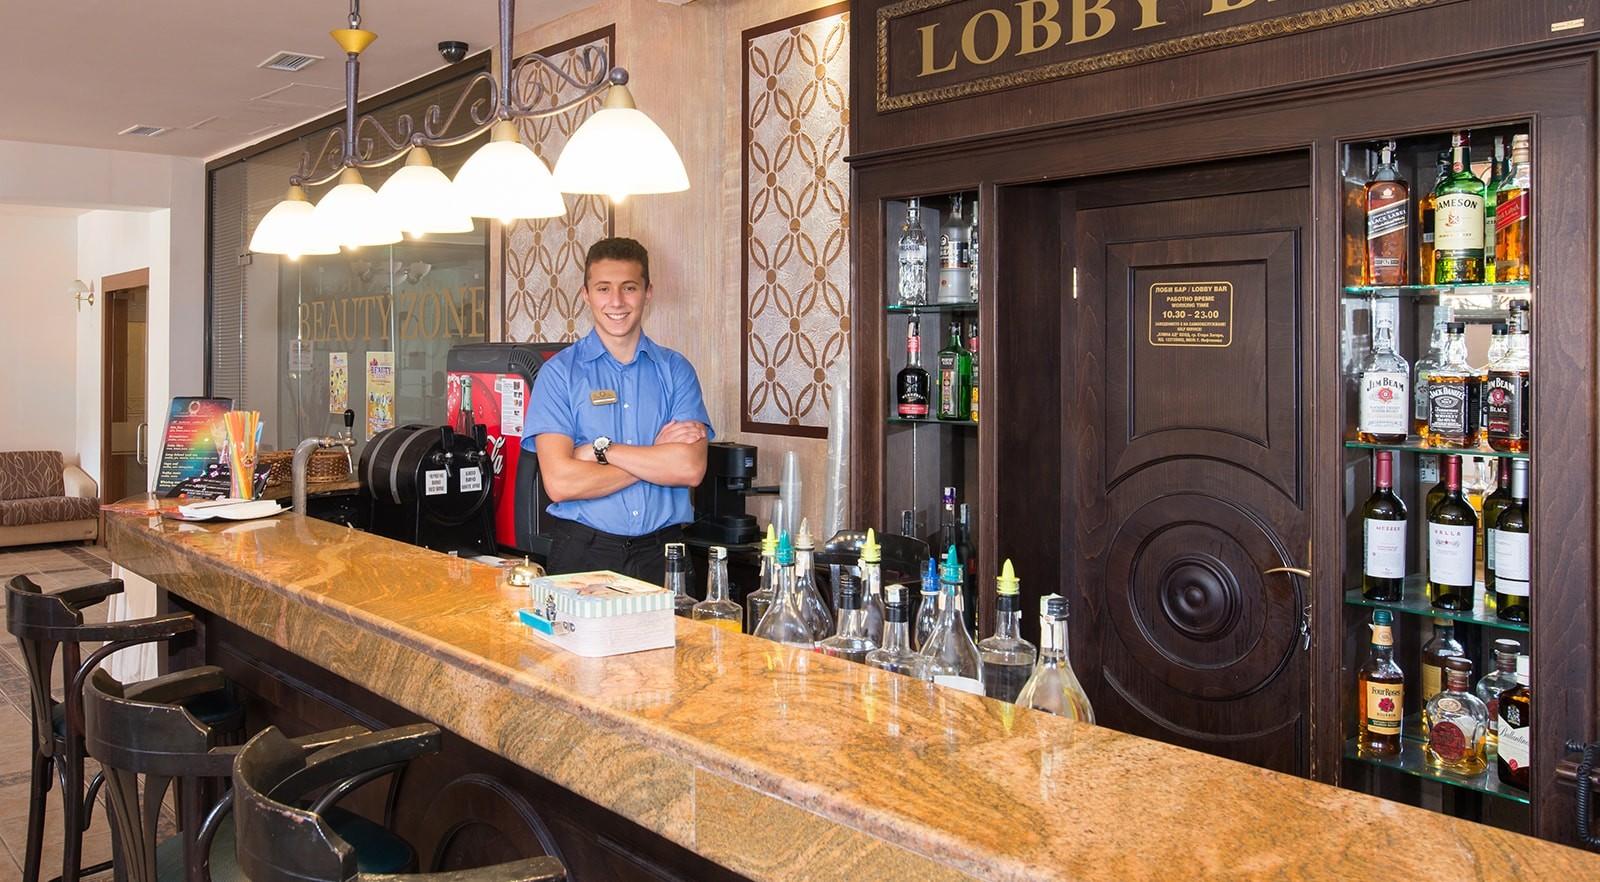 Хотел Цезар Палас 4* - лоби бар